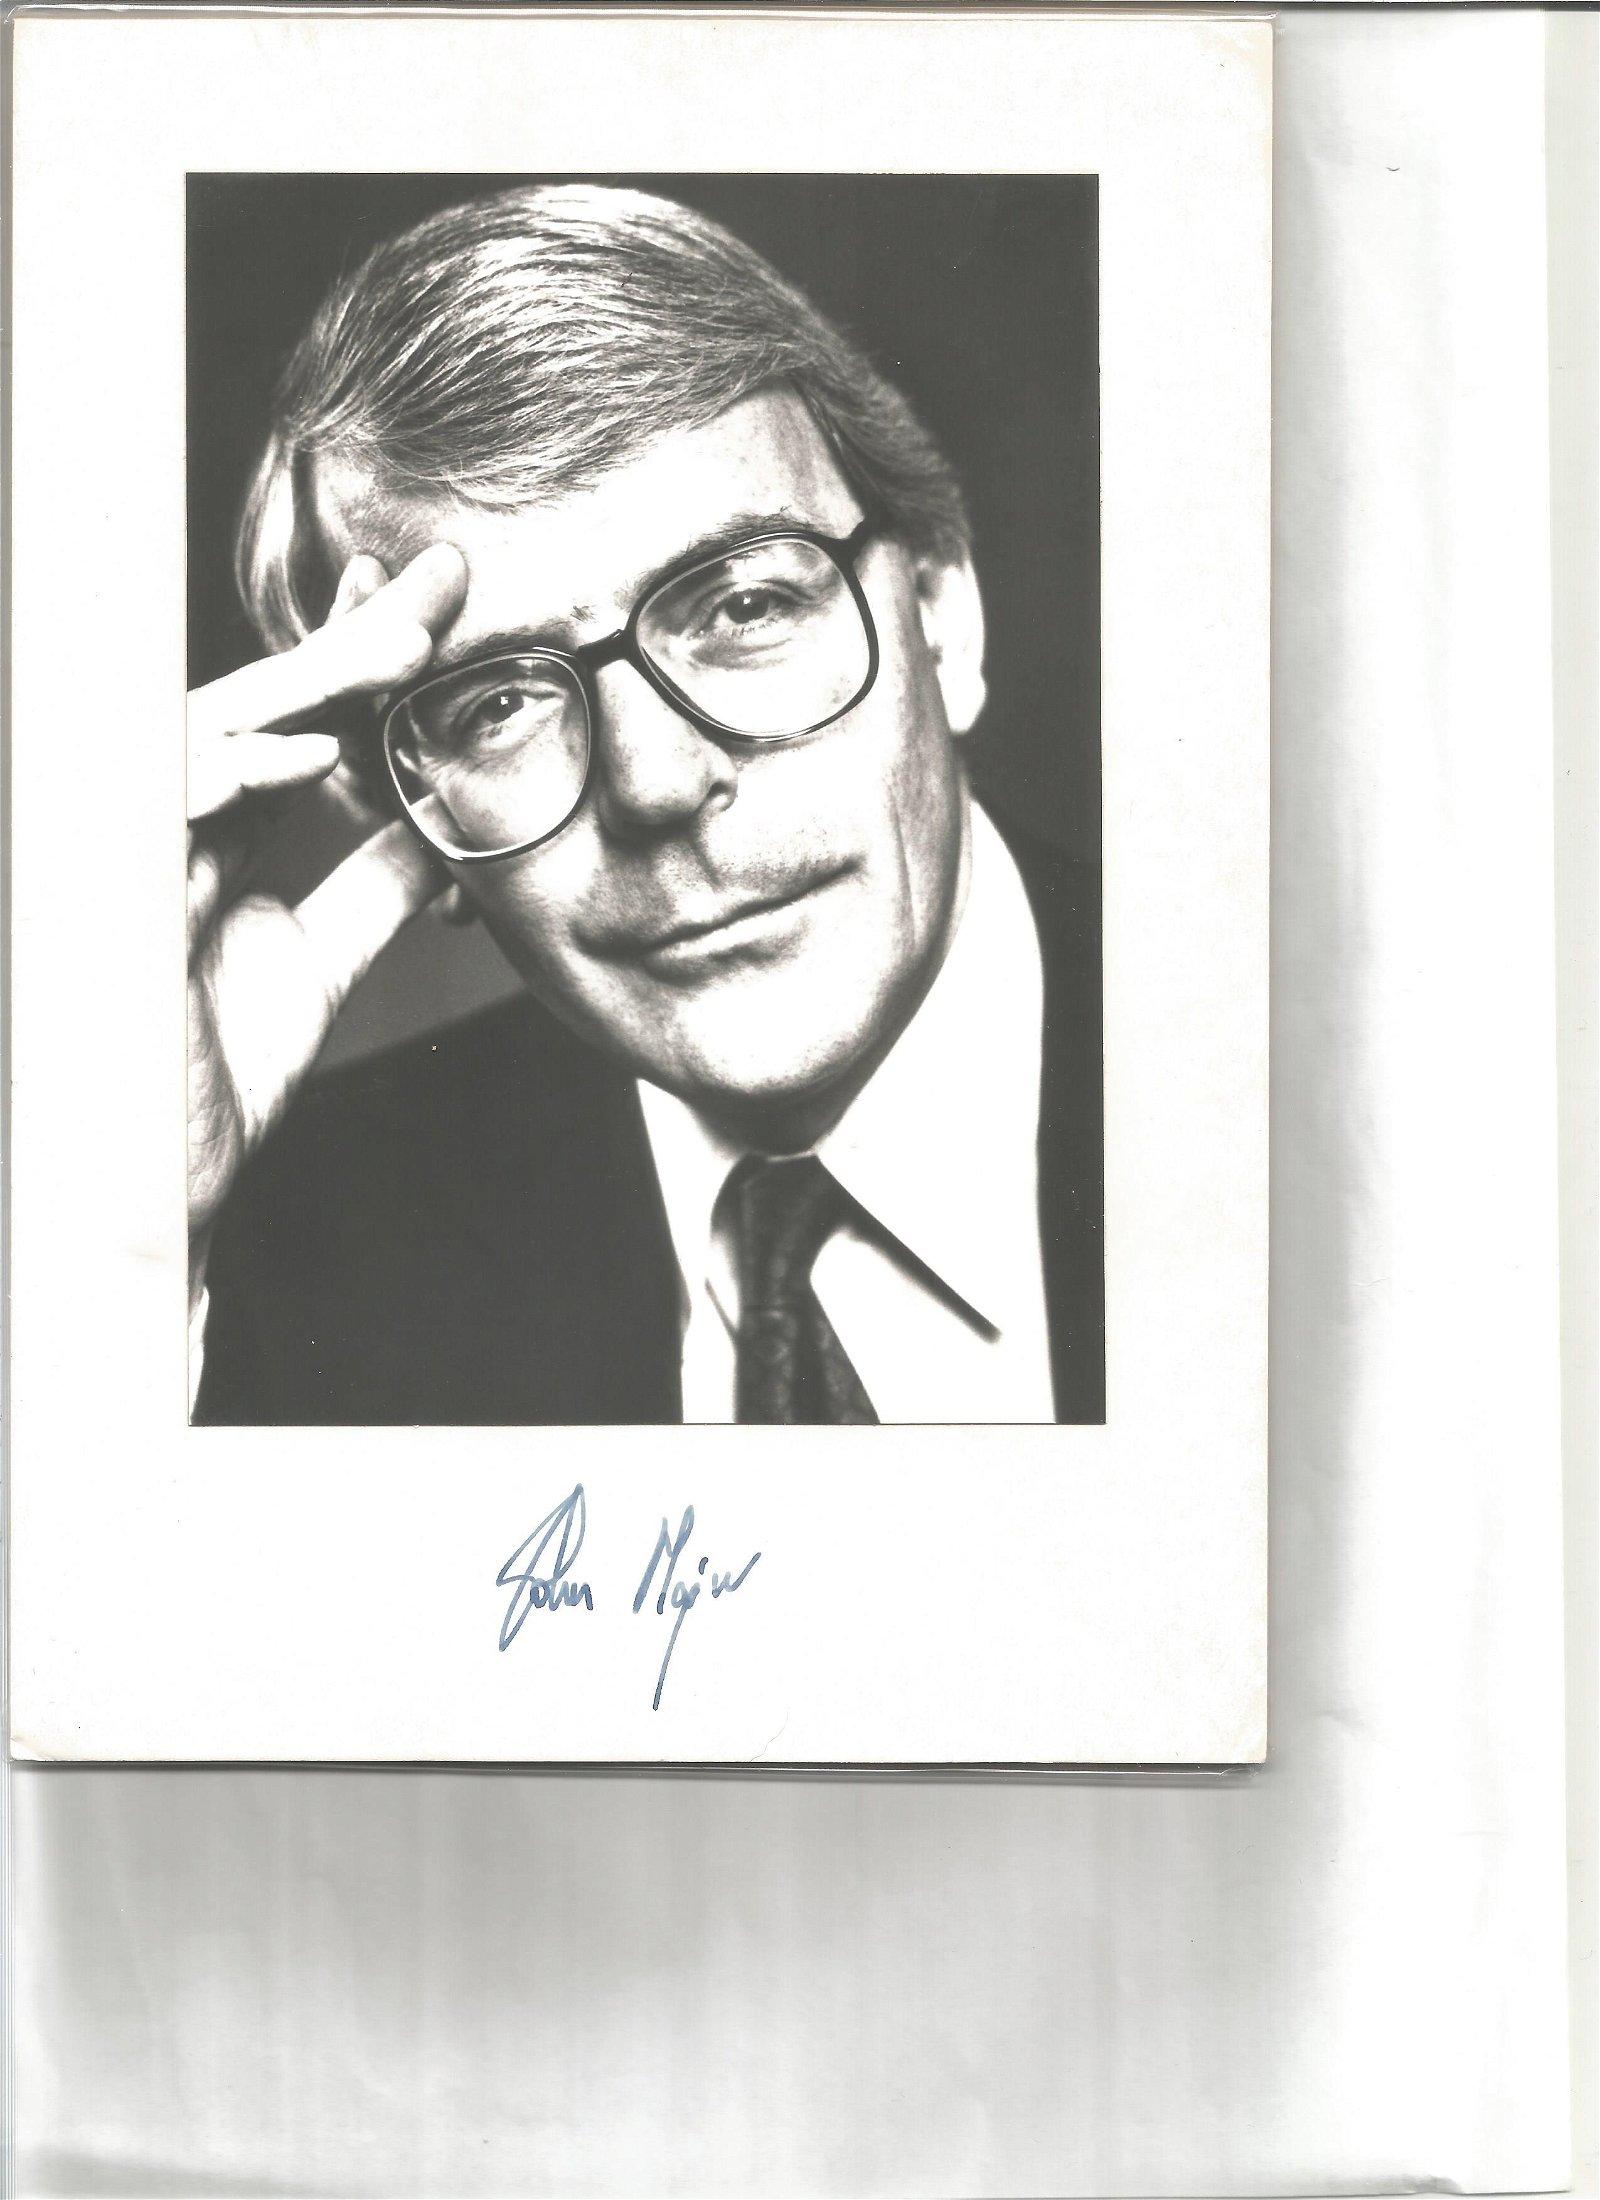 John Major signature piece below black and white photo.